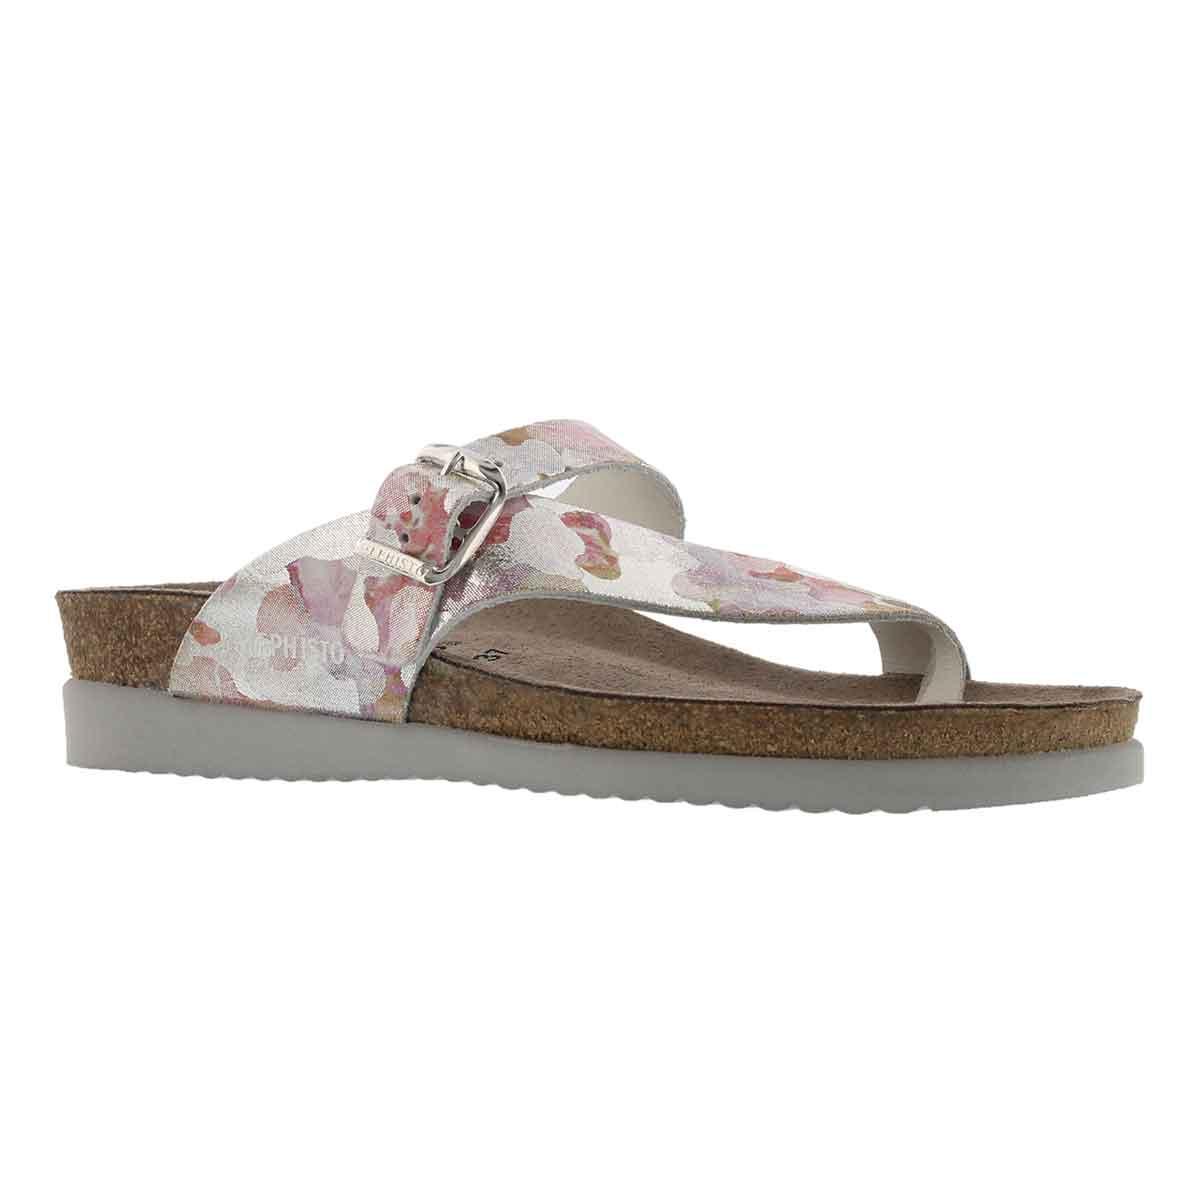 Lds Helen pink cork footbed thong